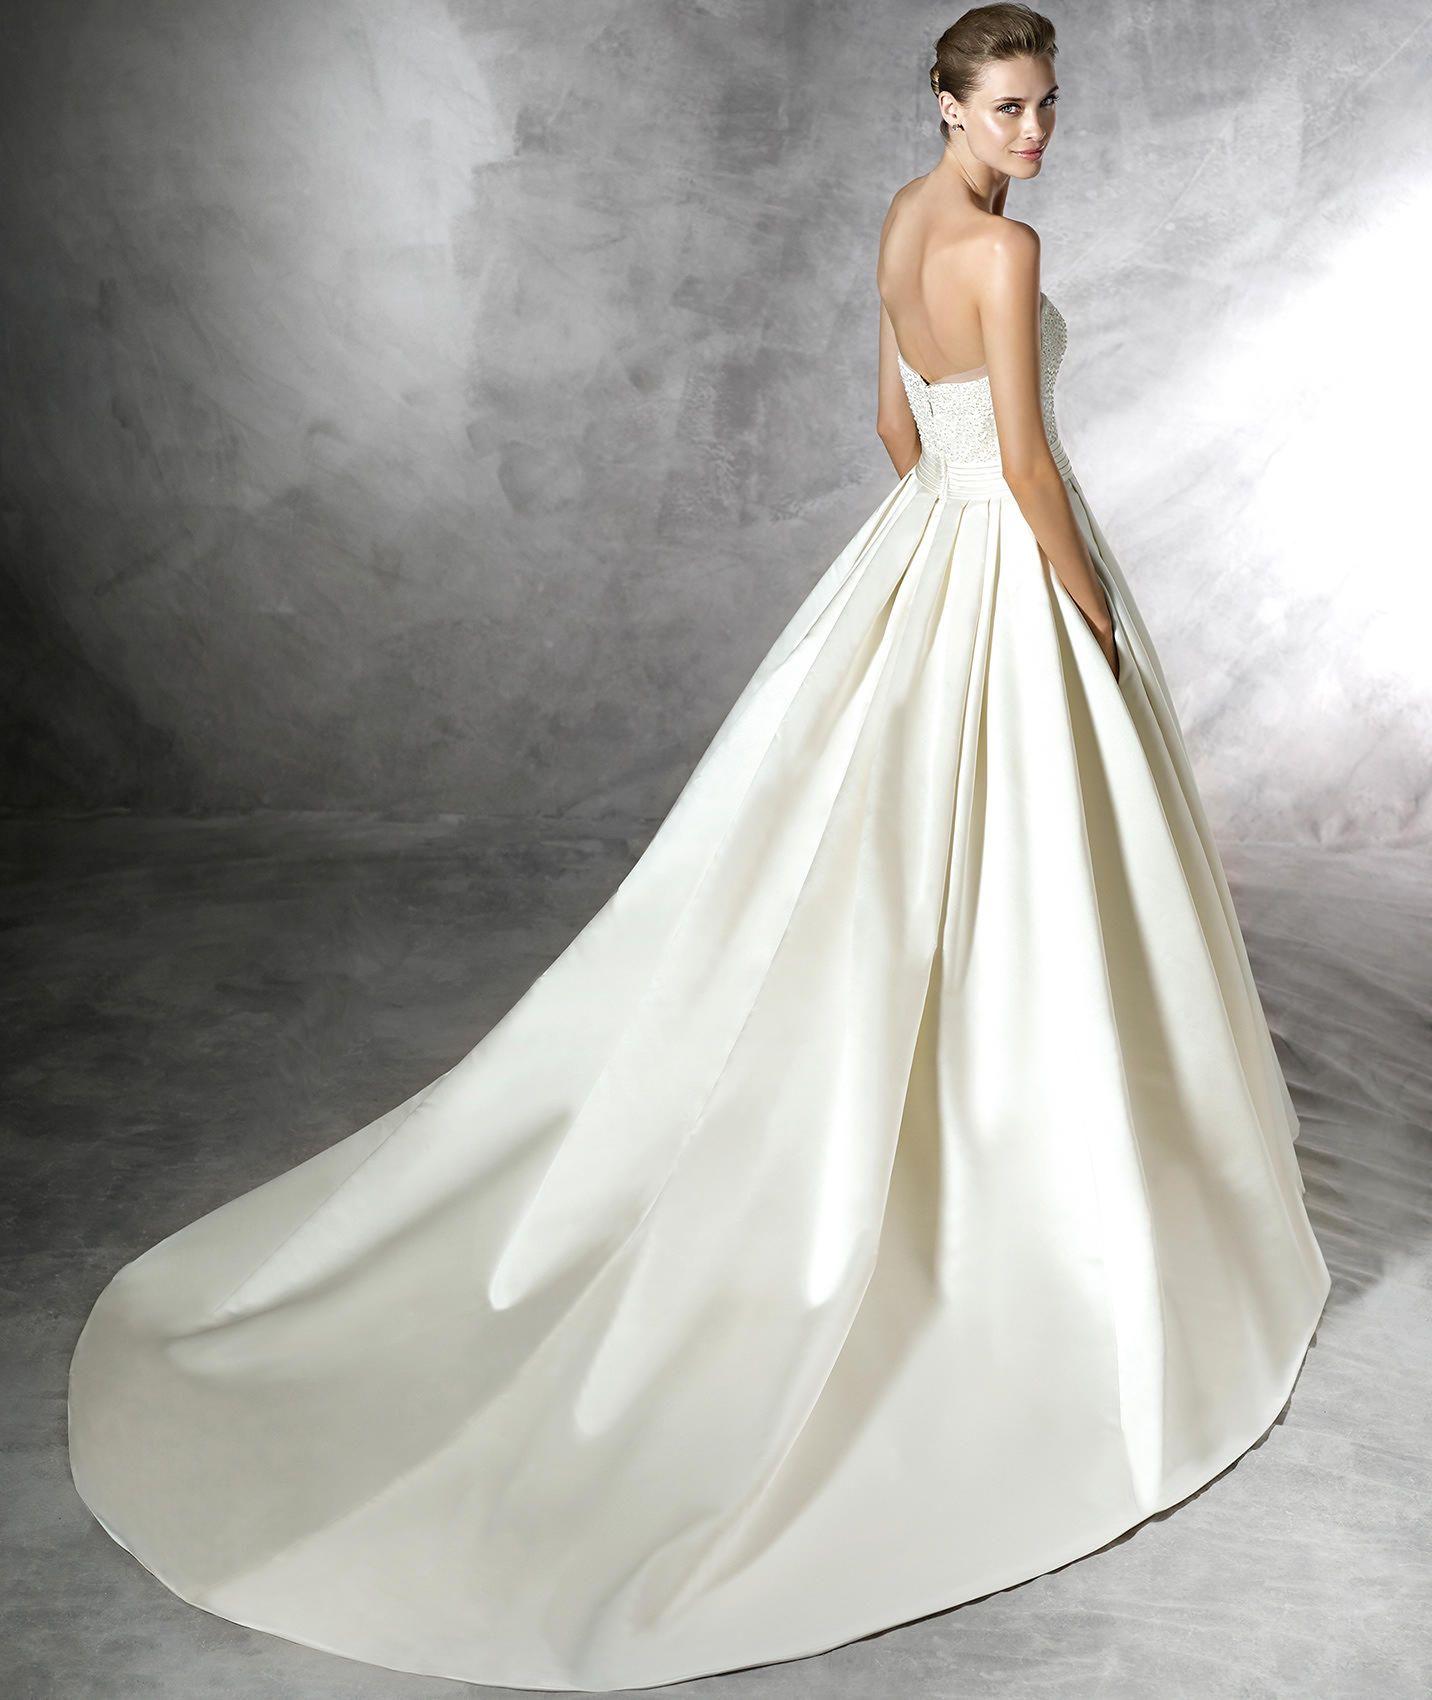 DALAMO - Vestido de novia escote palabra de honor estilo princesa ...